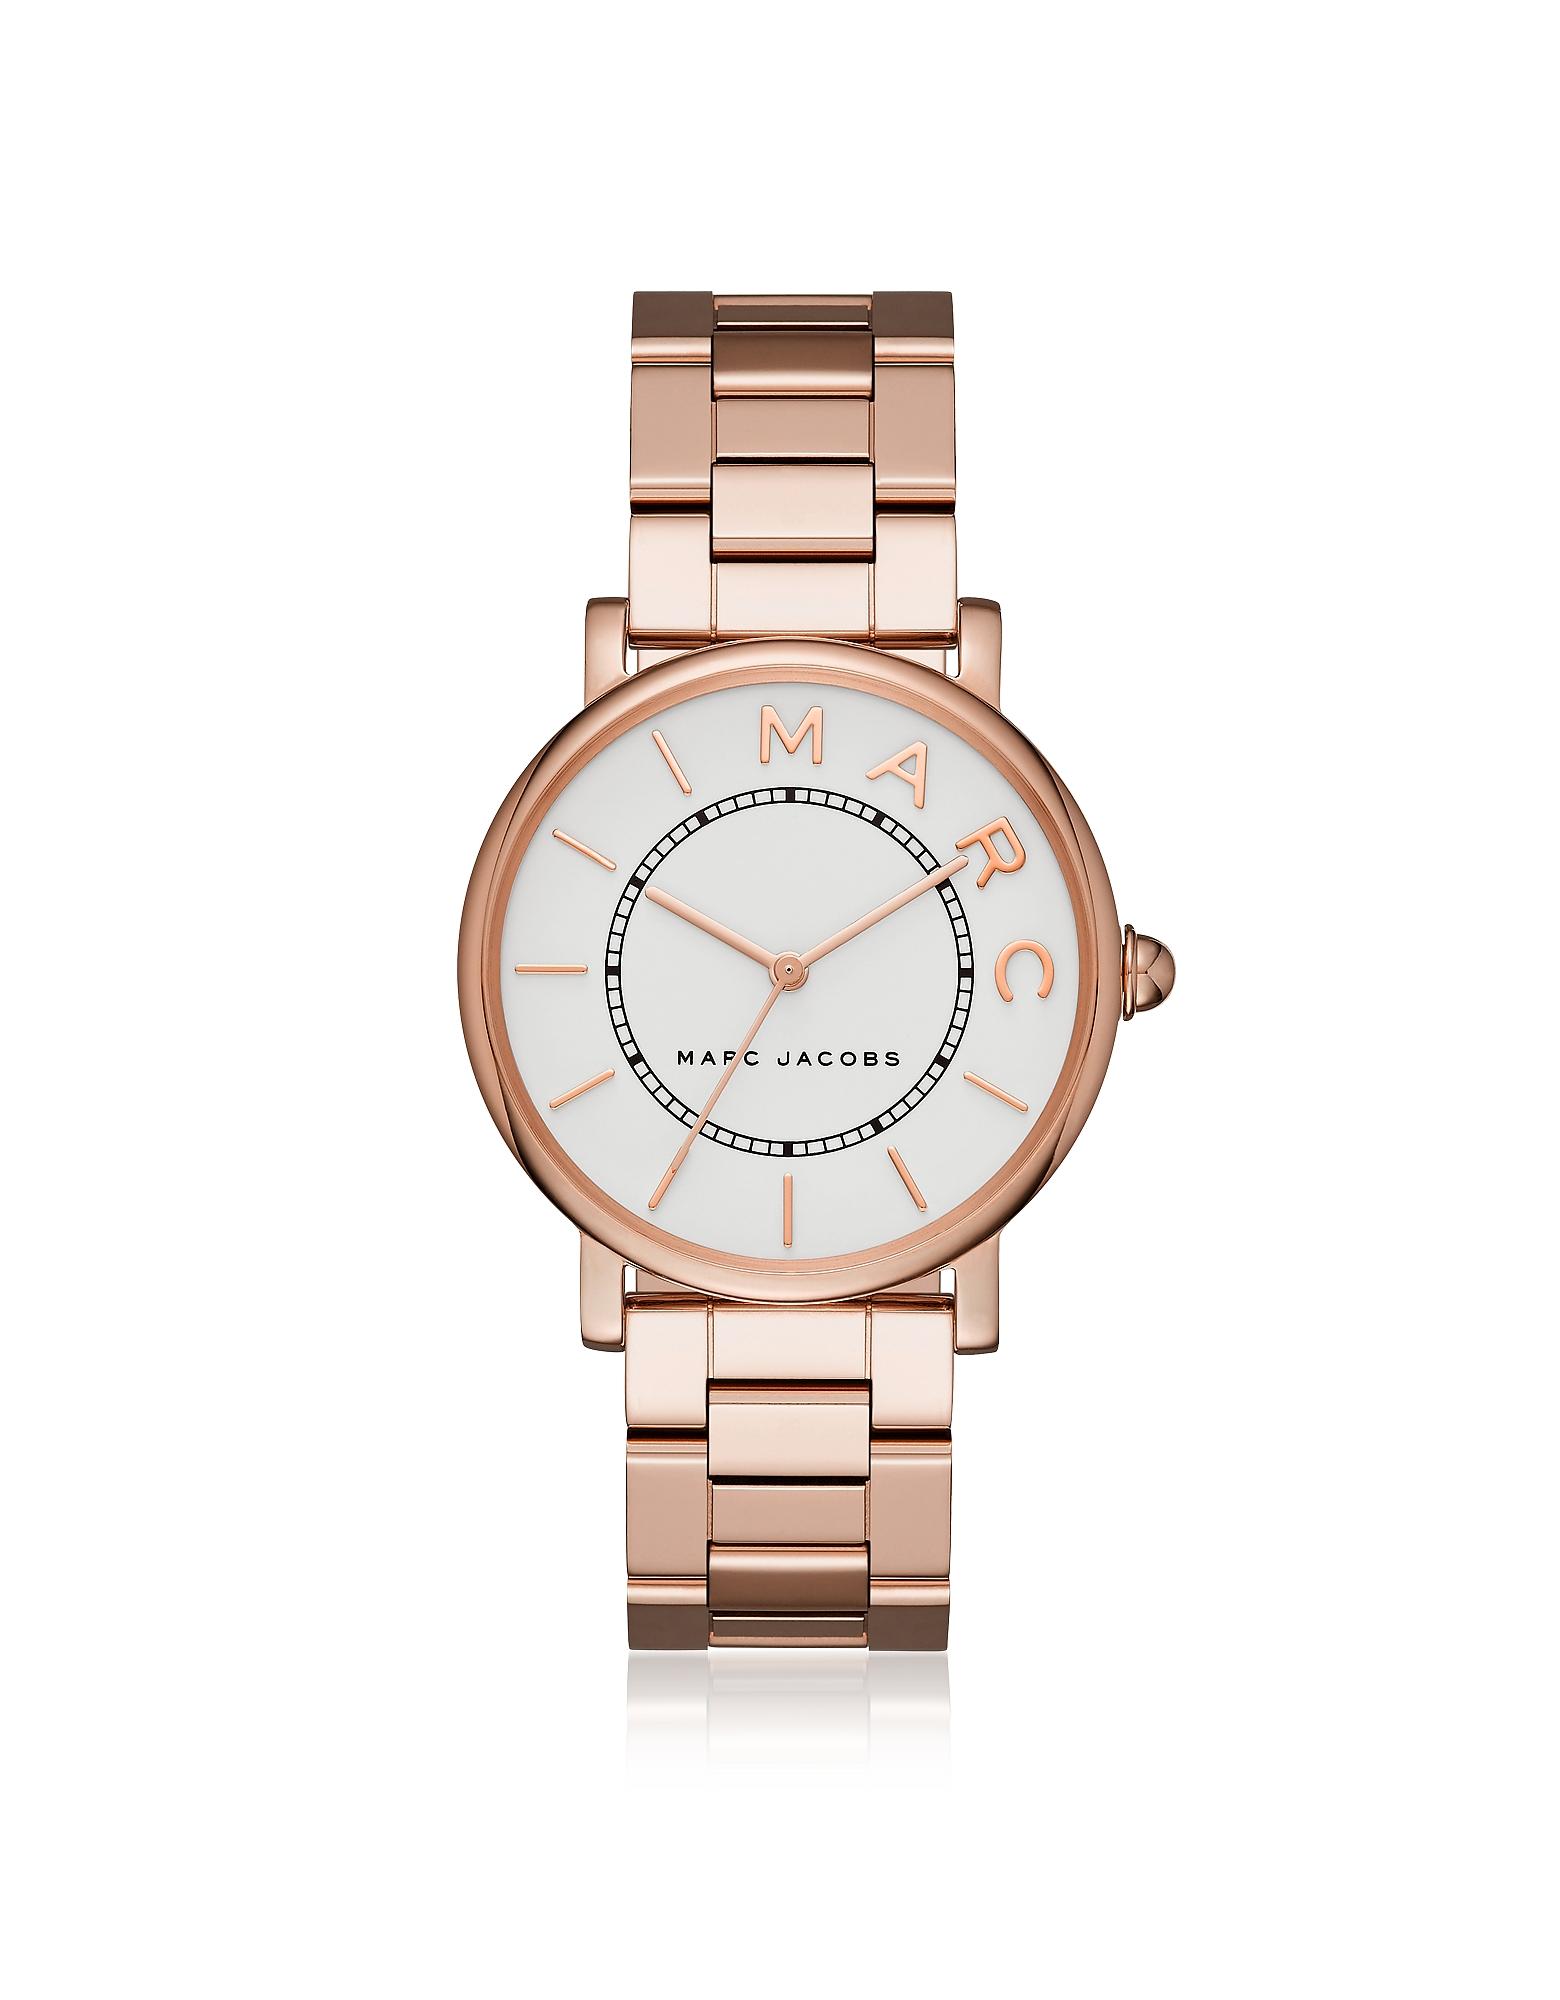 Marc Jacobs Women's Watches, Roxy Rose Gold Tone Women's Watch